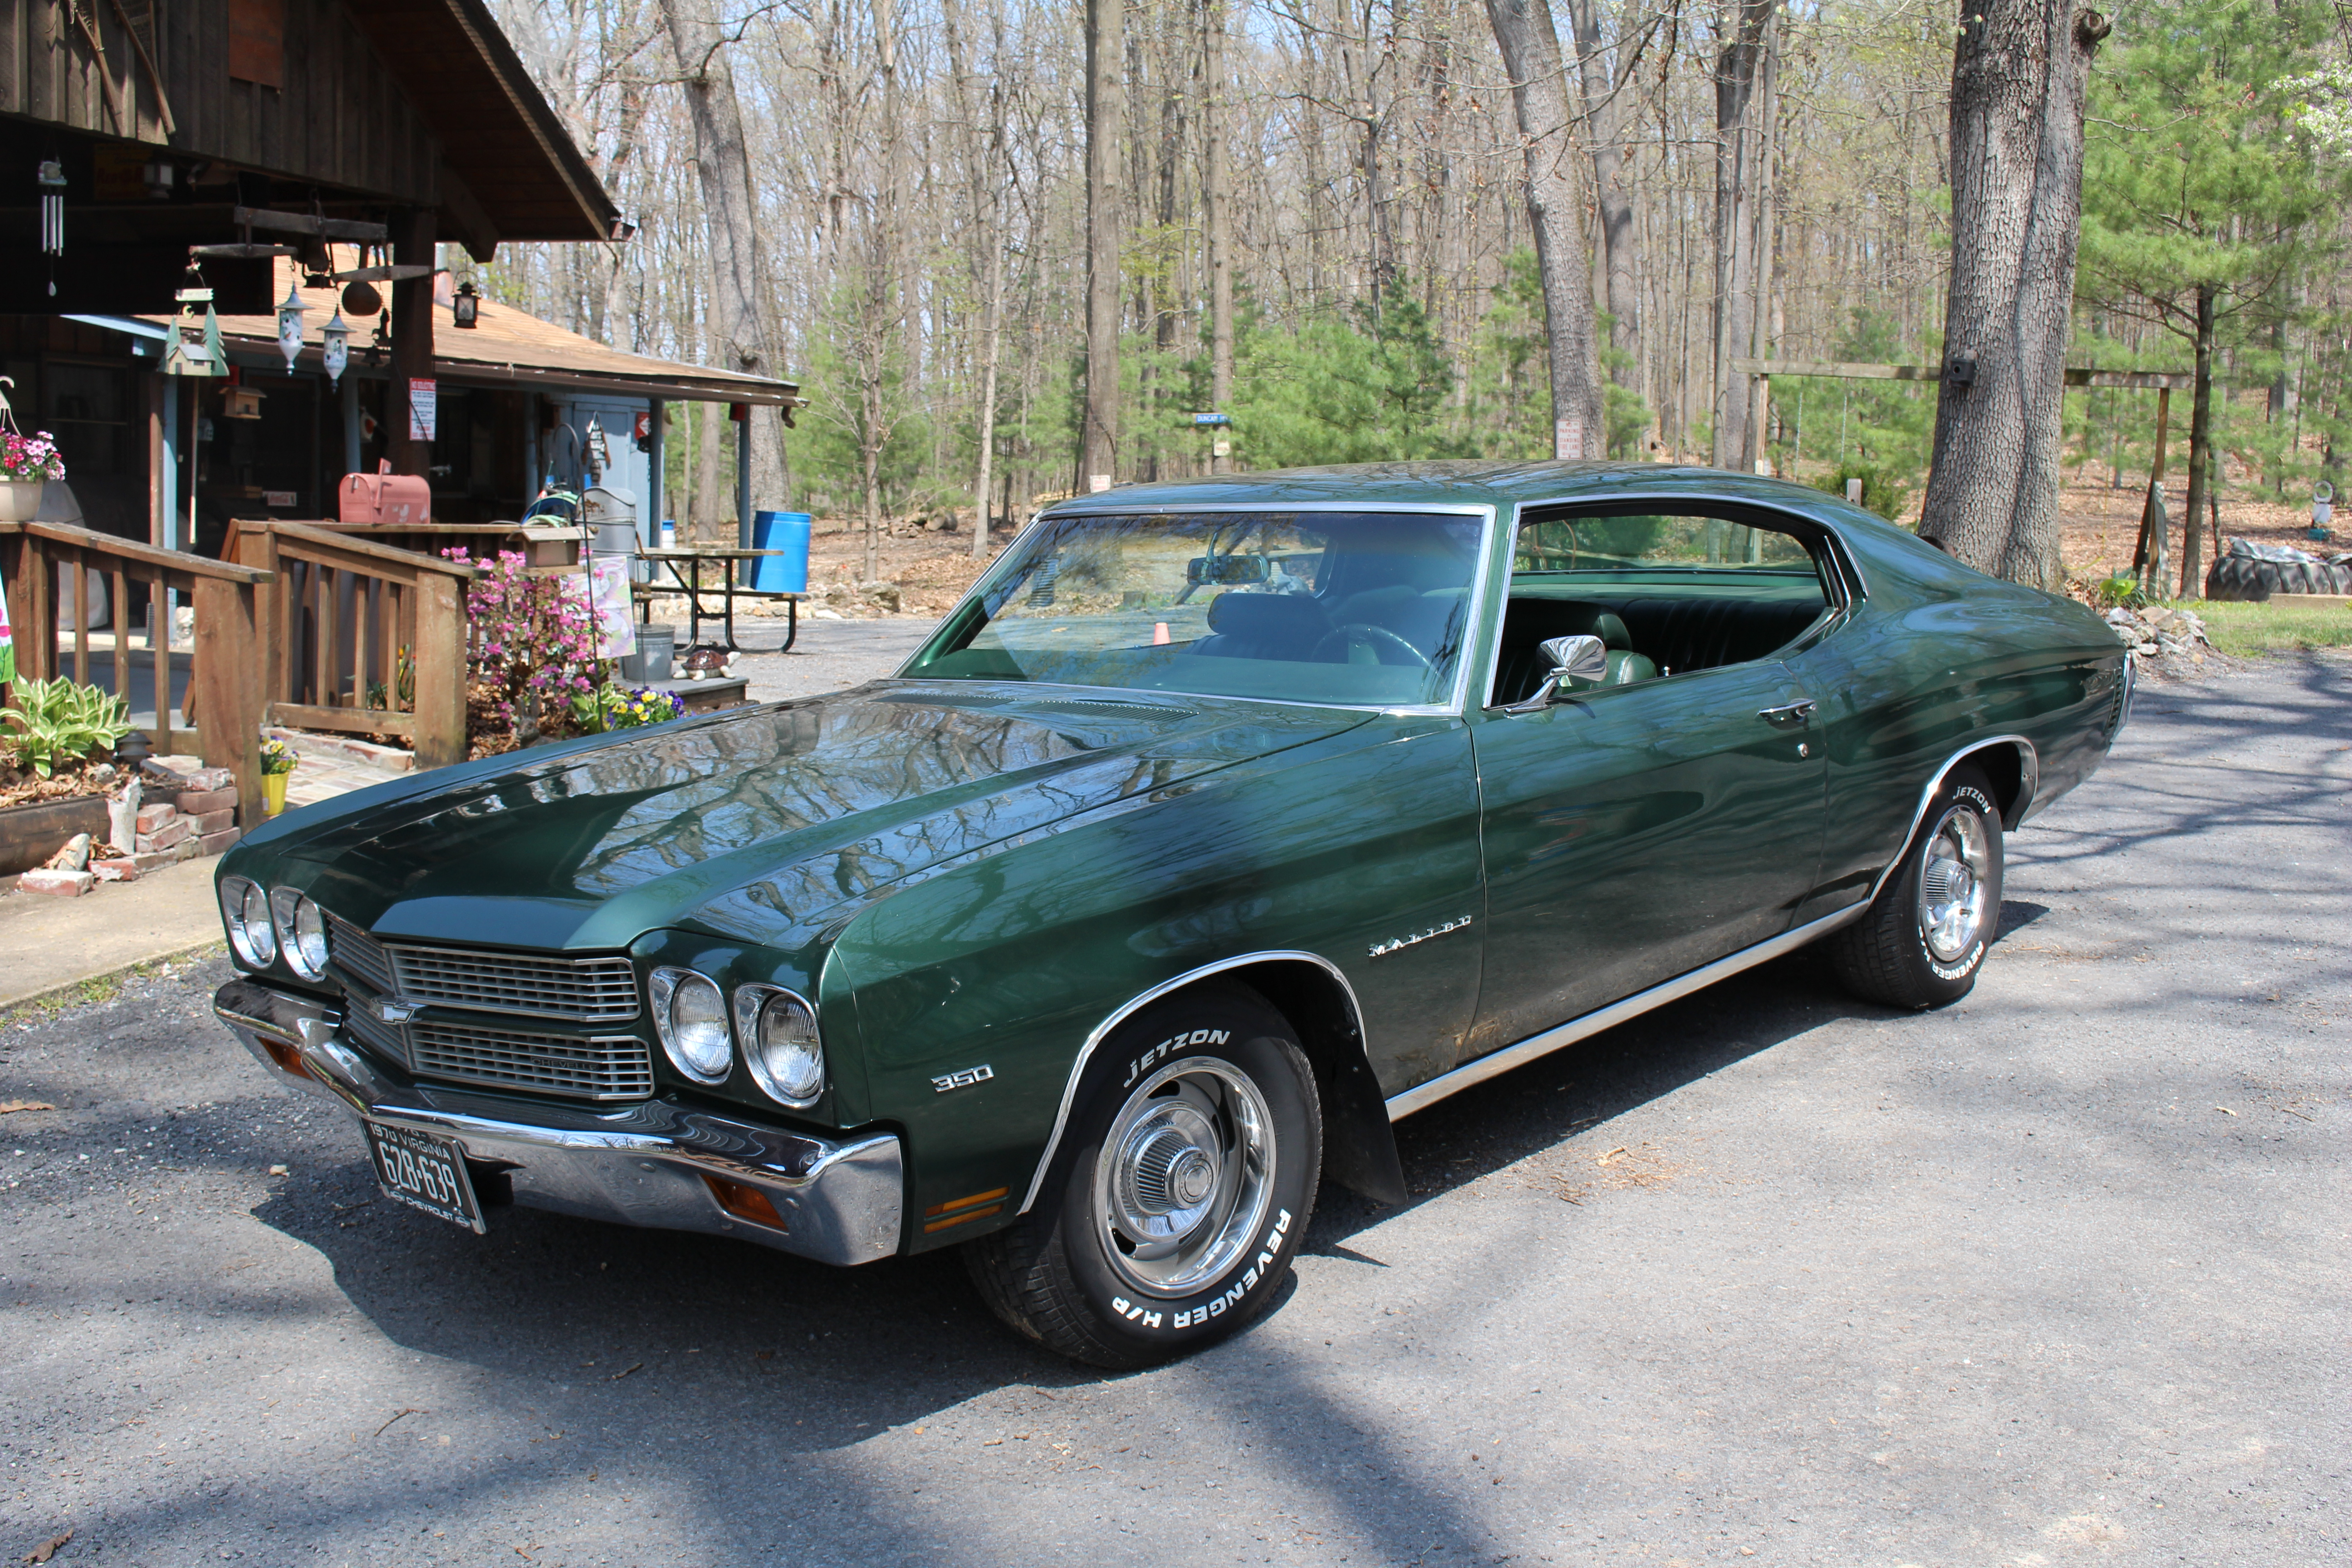 chevrolet sale s impala cars for reviews carlo ss monte original photo review